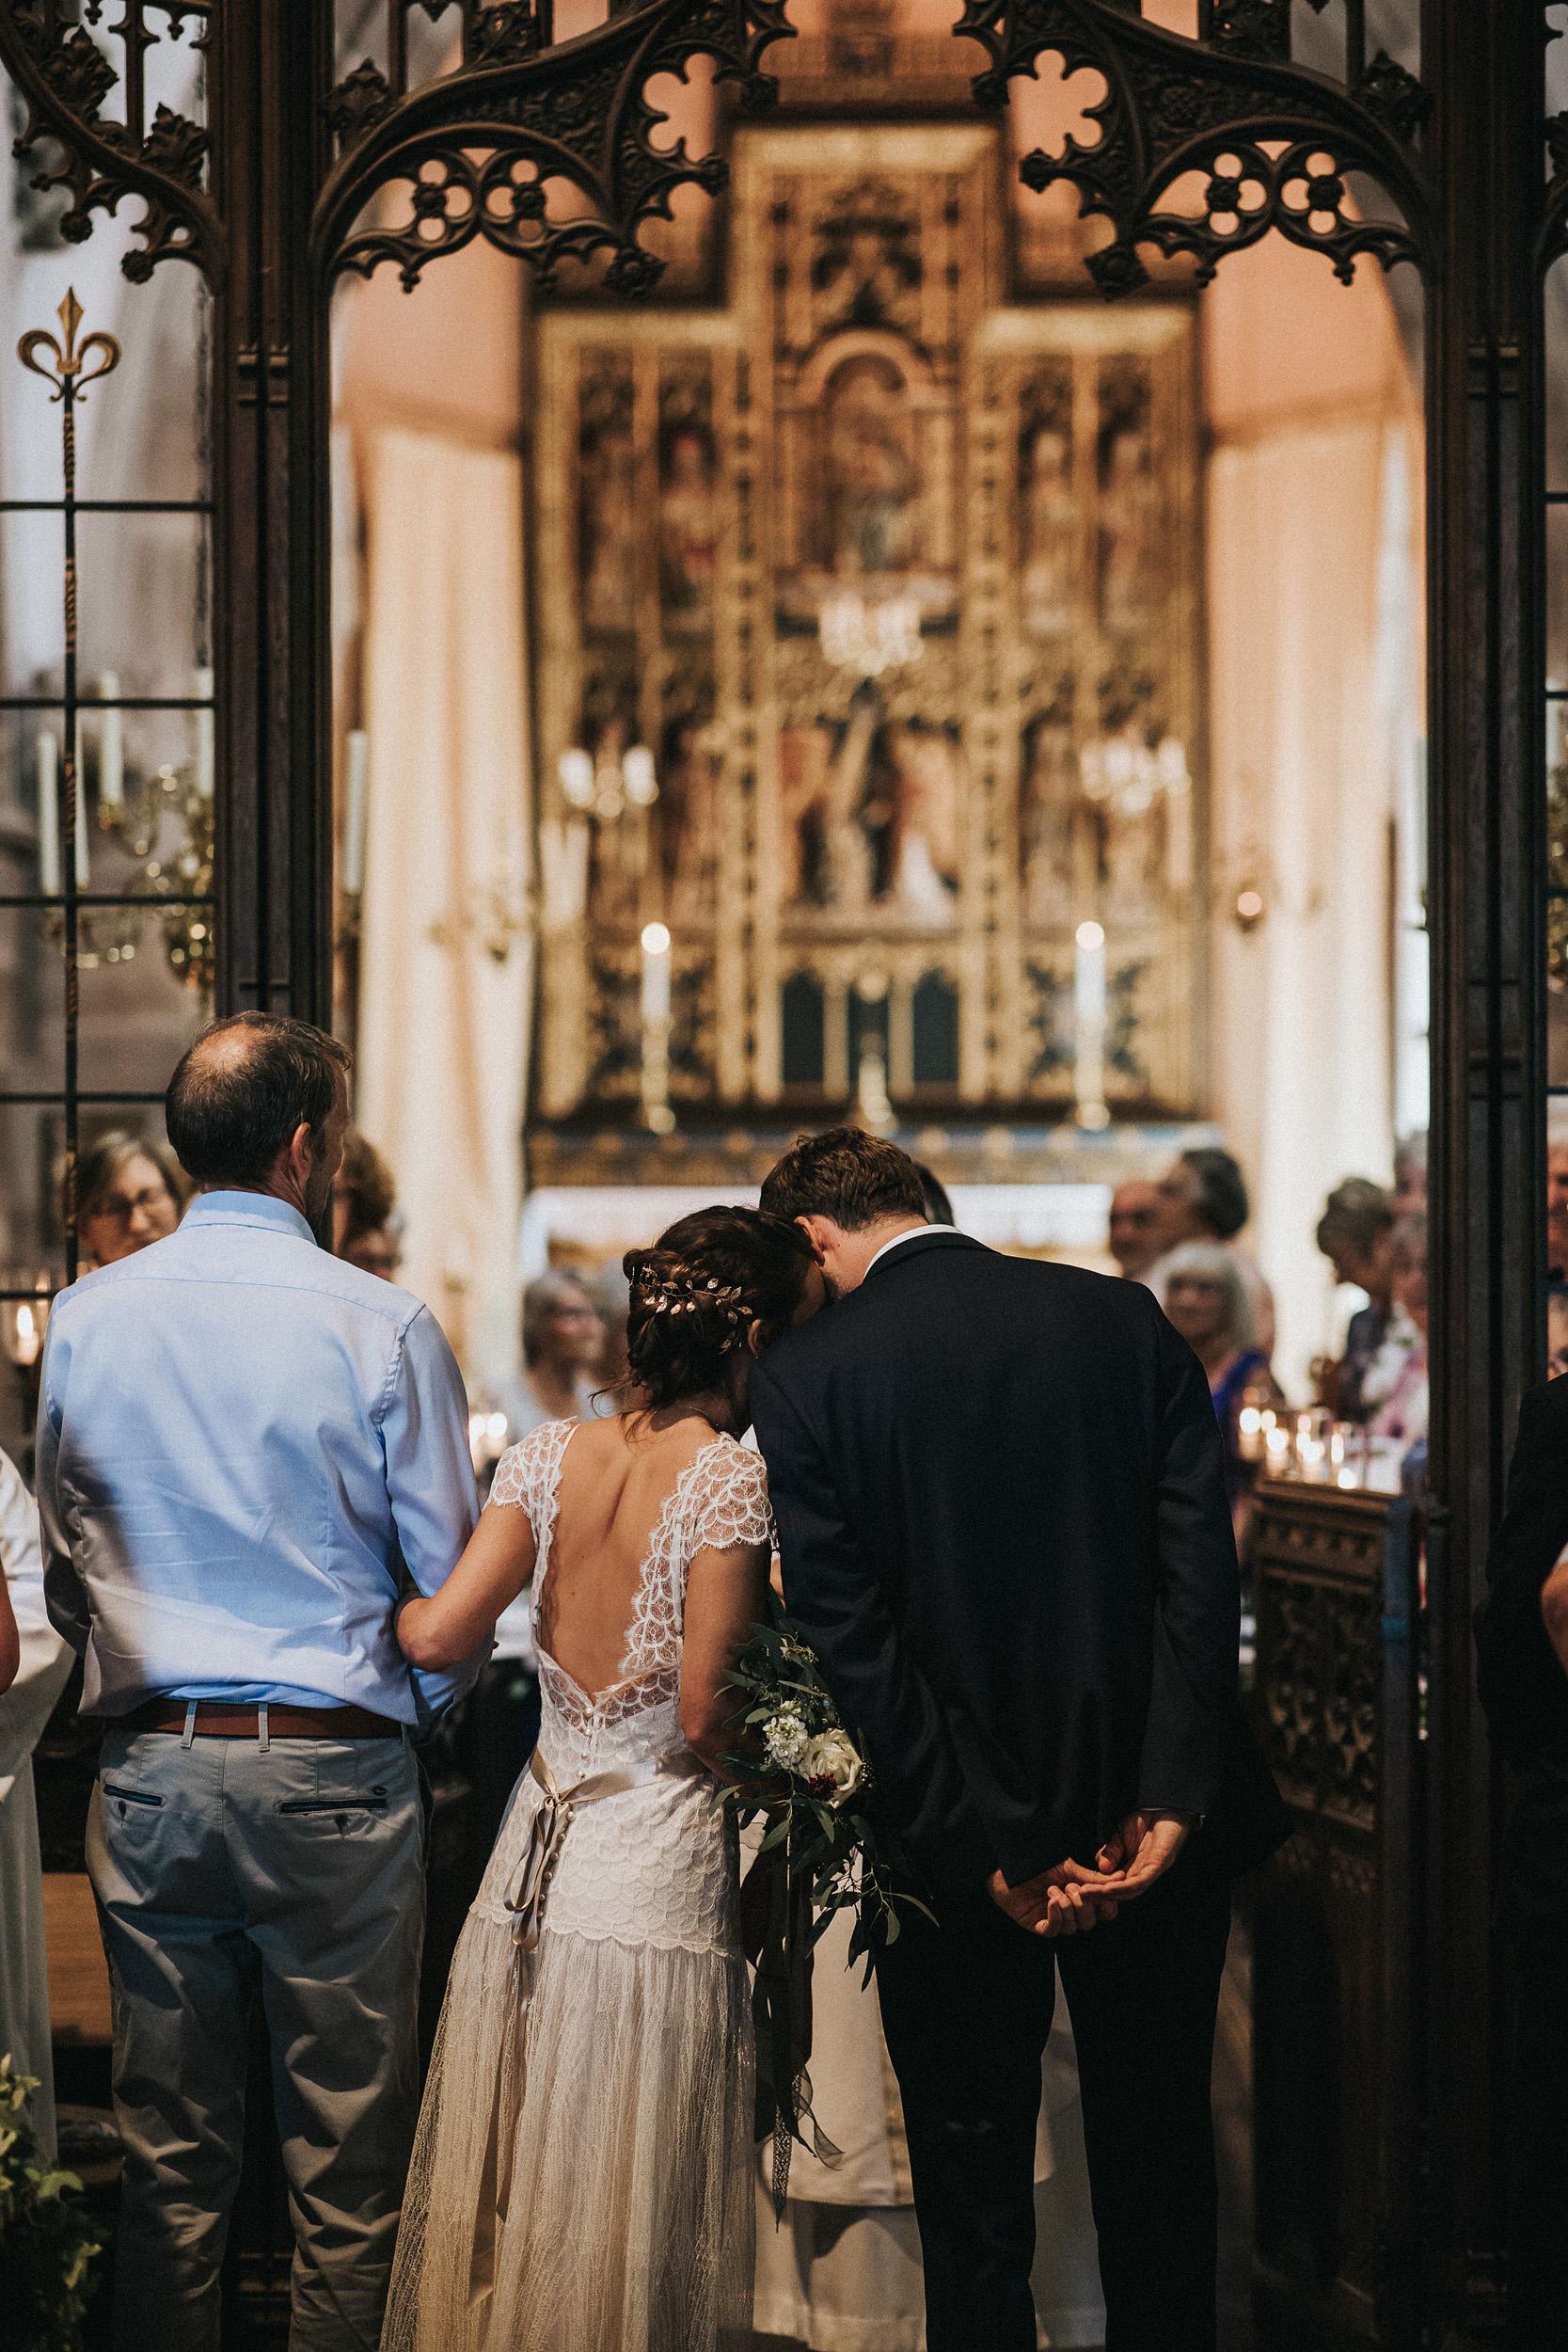 Martha-Laid-Back-Garden-Wedding-Lace-Wedding-Dress-Bohemian-Kate-Beaumont-13.jpg